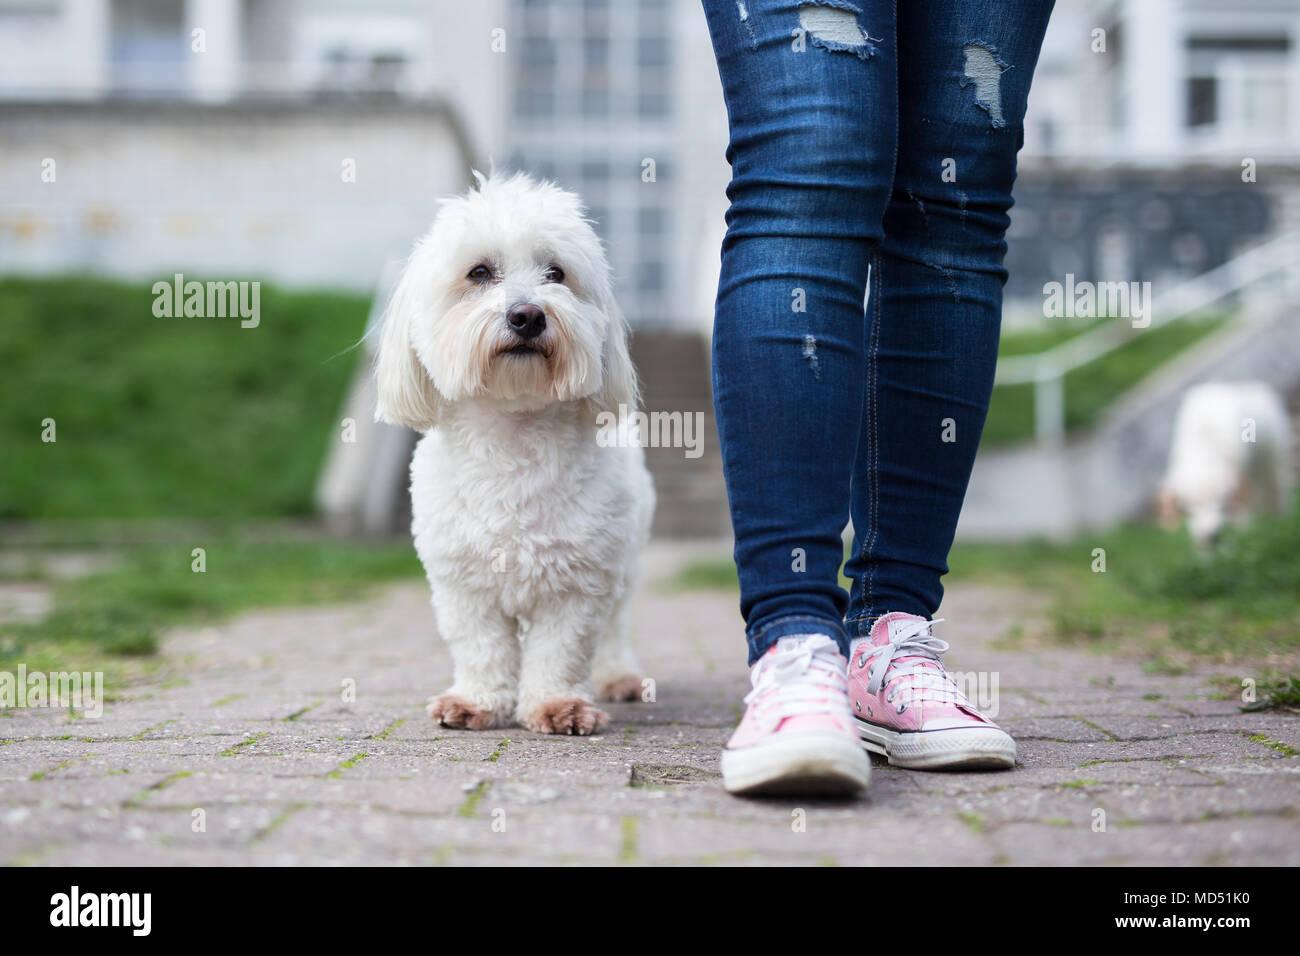 Girl walking with white fluffy dog - Stock Image